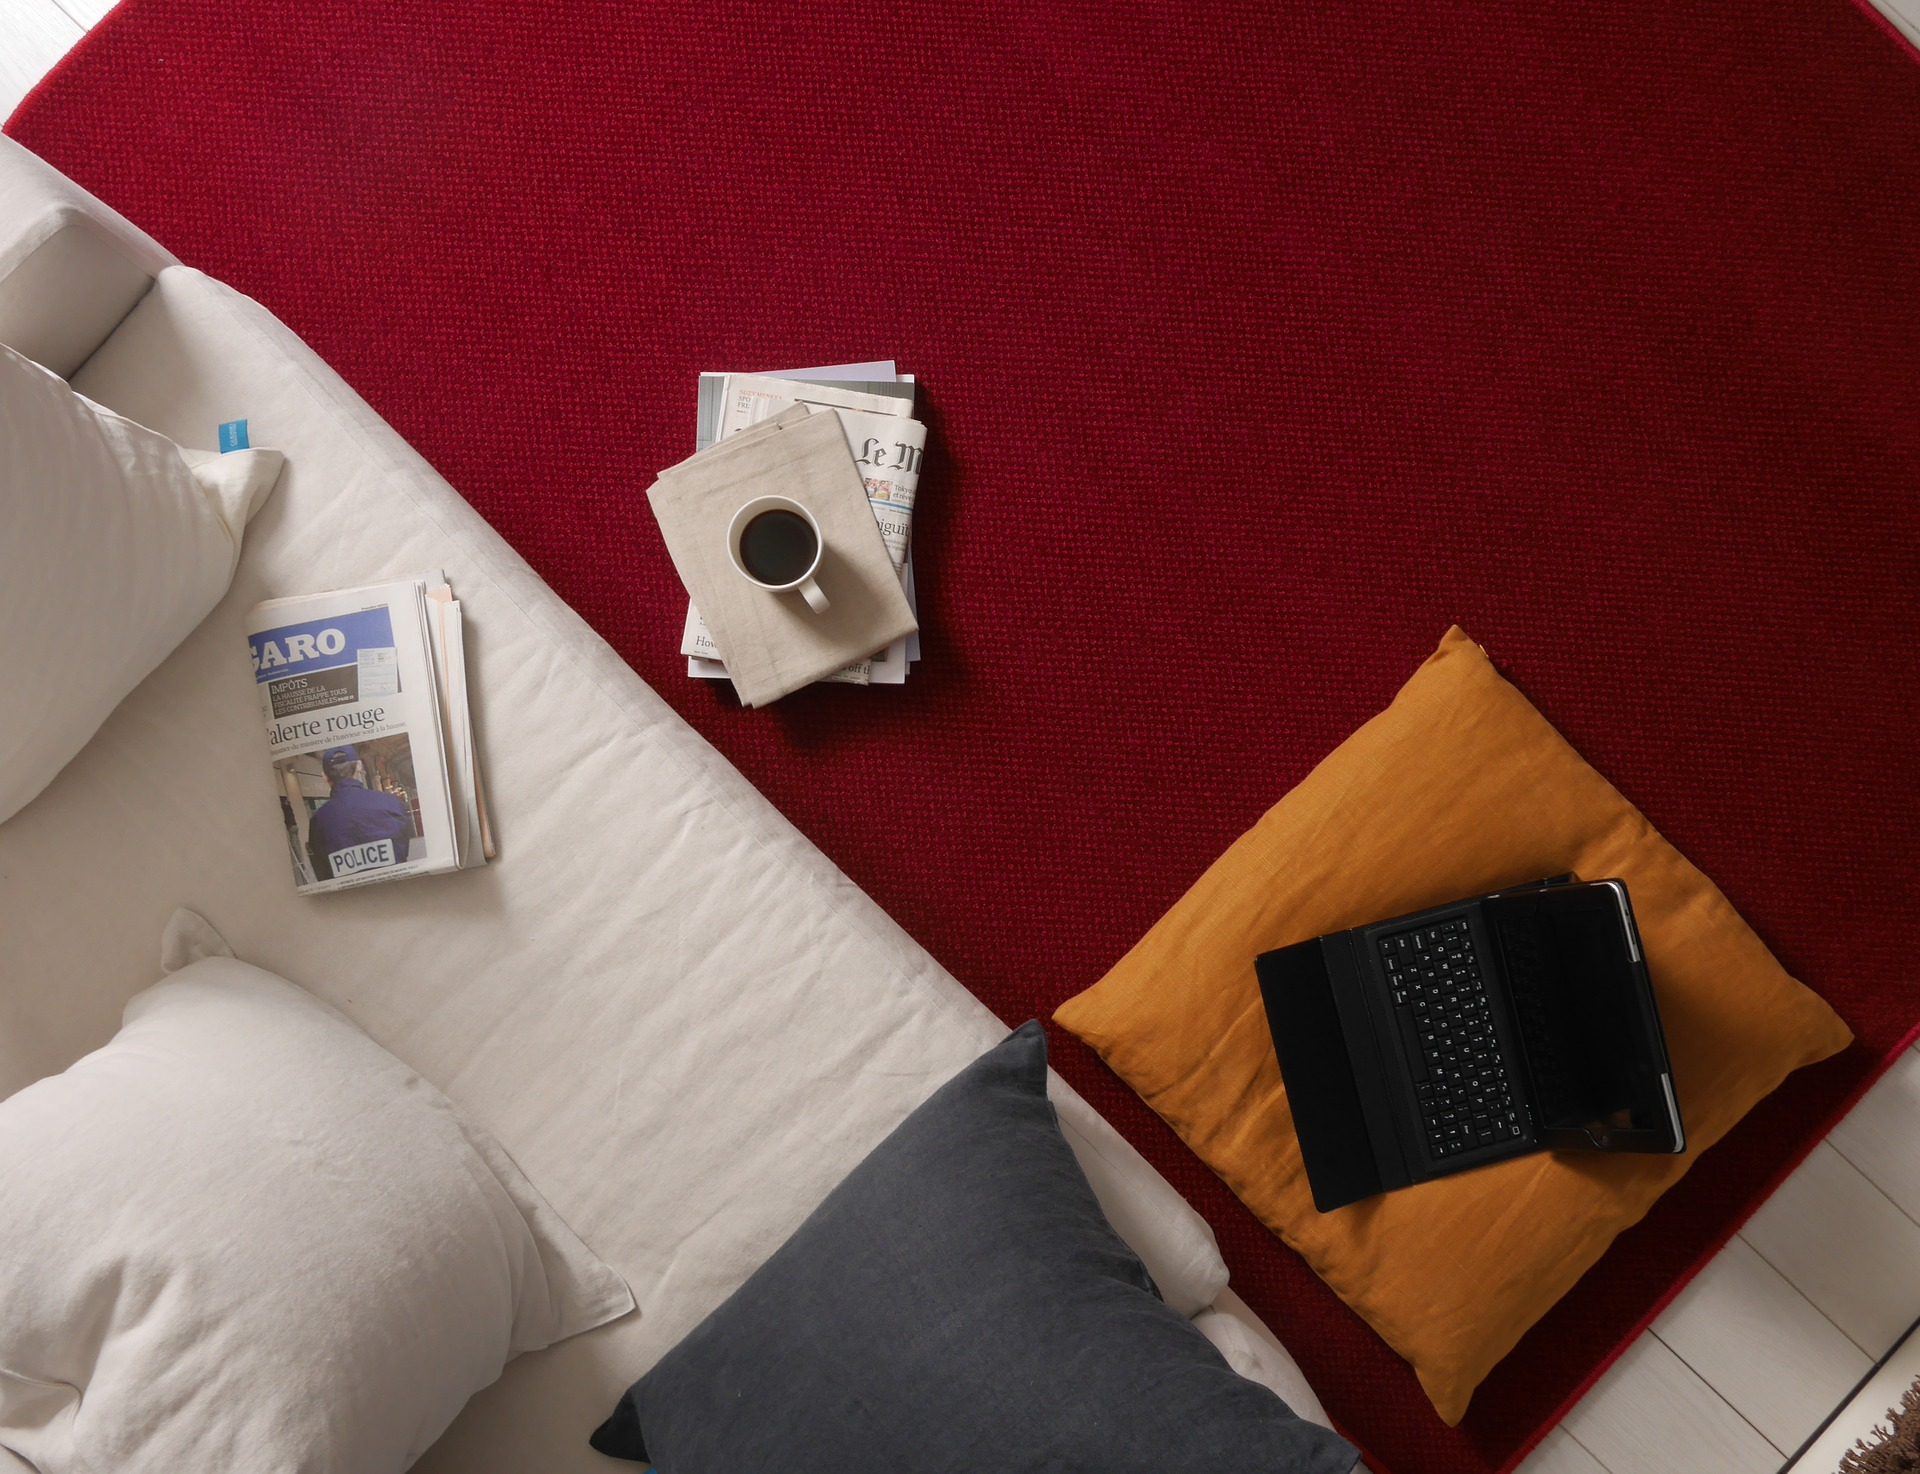 living-room-1001932_1920